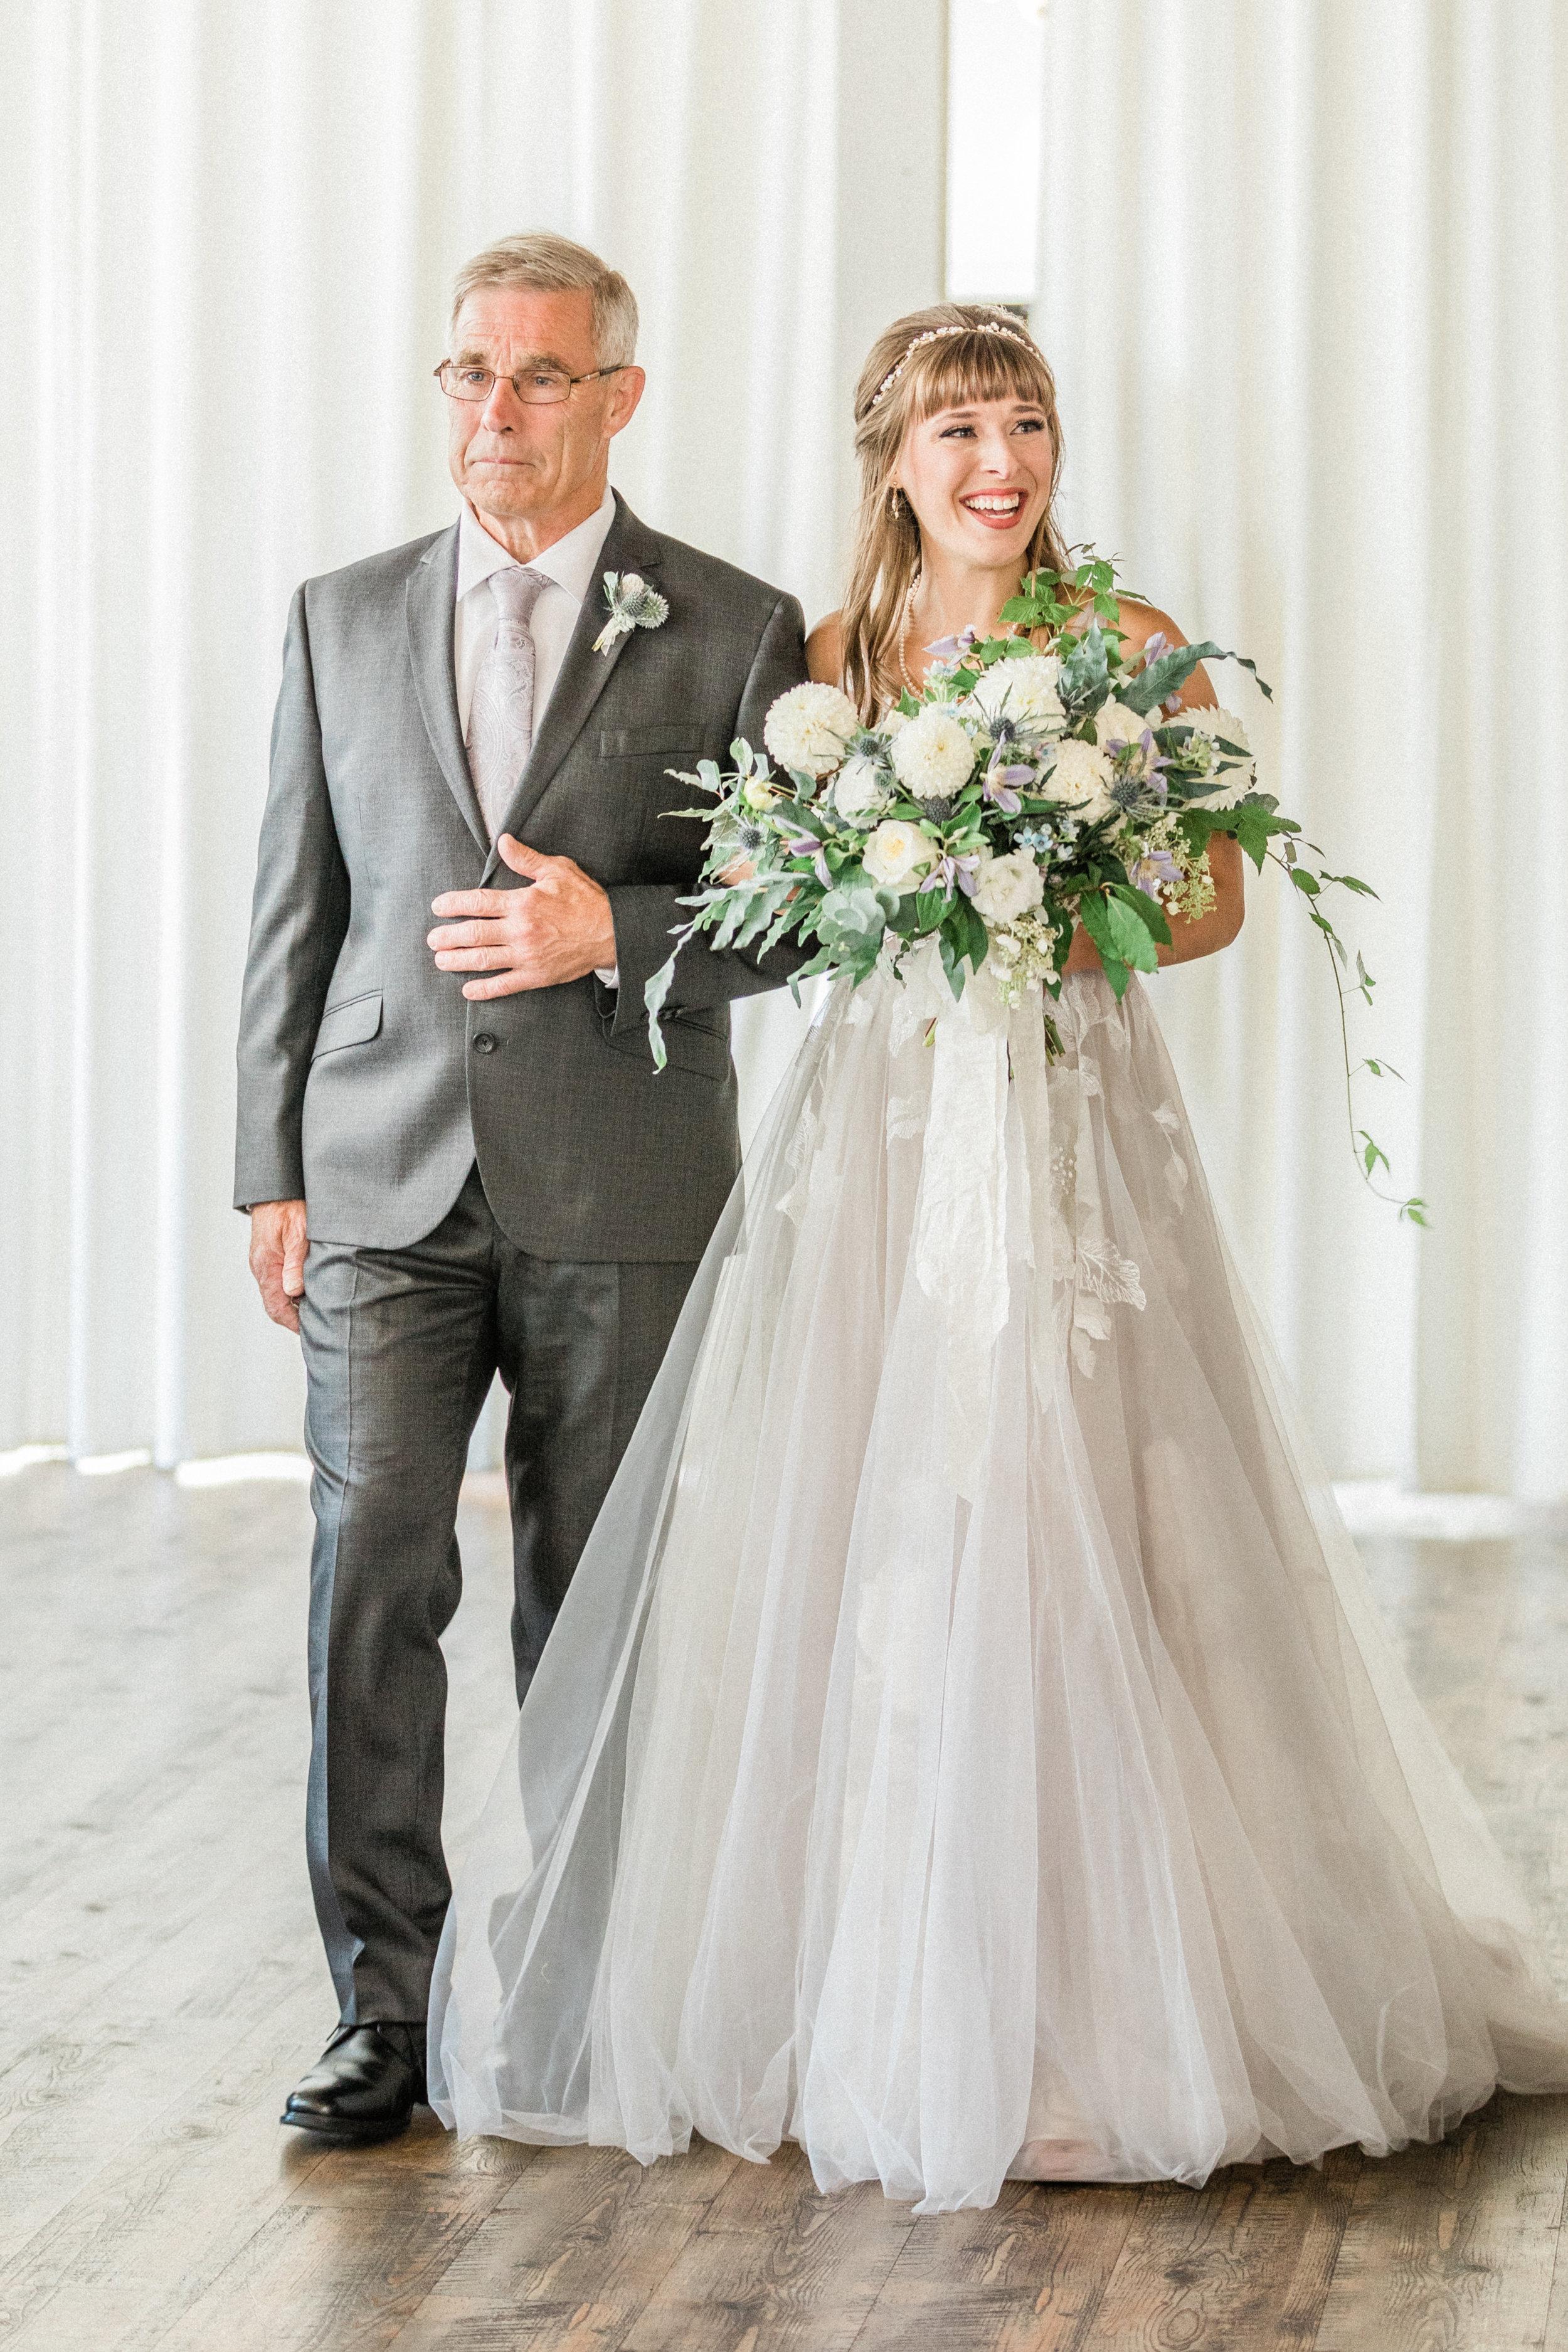 Mallory and Aaron - Married - Sneaks - Lauren Alisse Photography-33.jpg